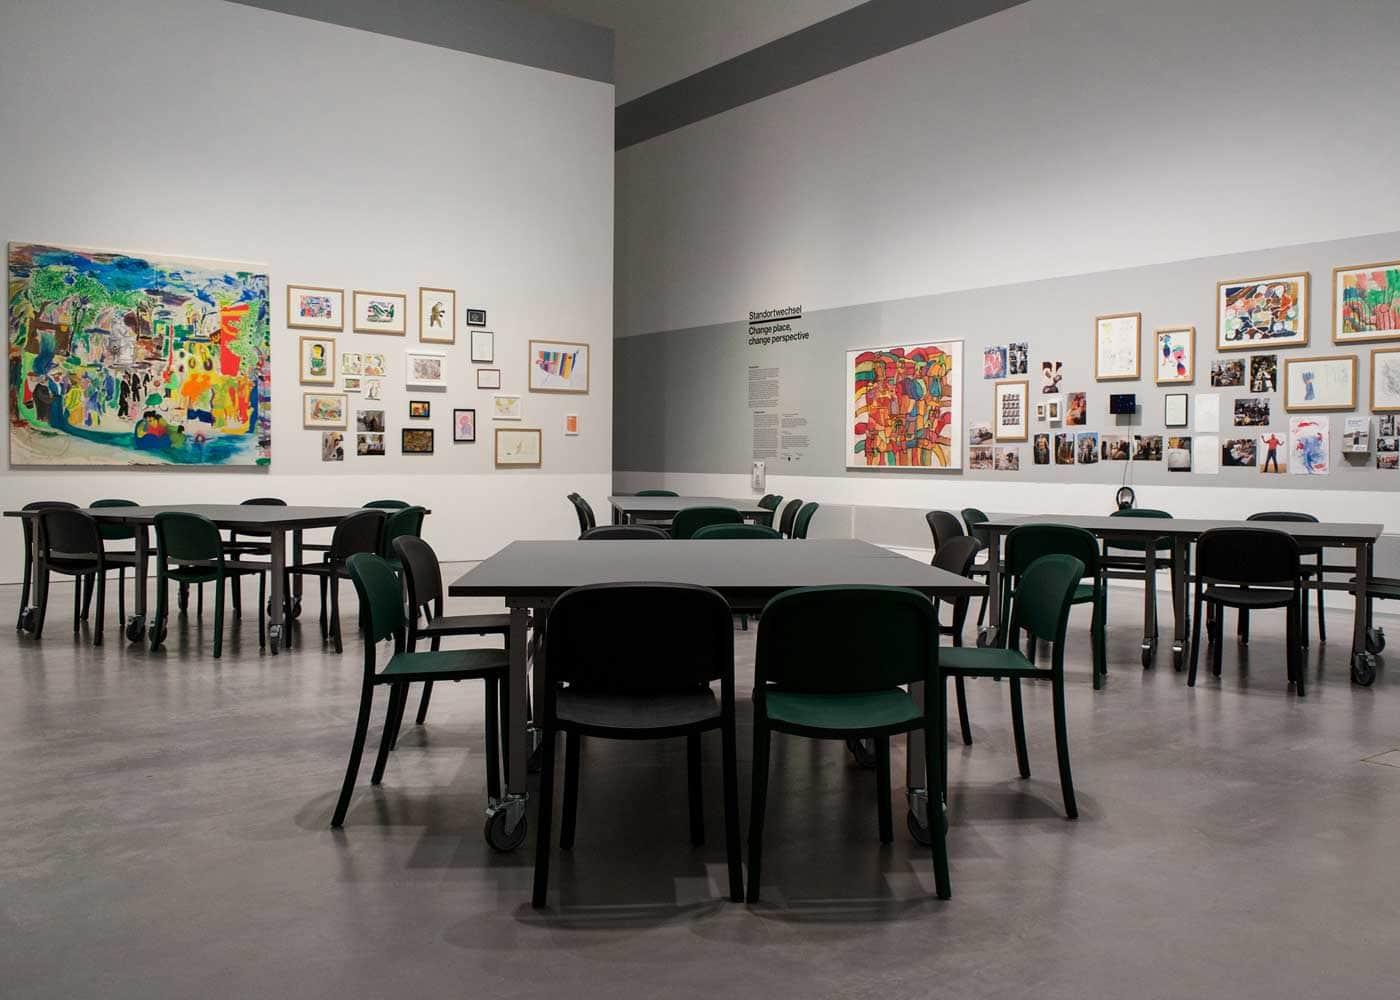 Kultur-Tipps für Familien mit Kindern in Berlin: Berlinische Galerie // HIMBEER